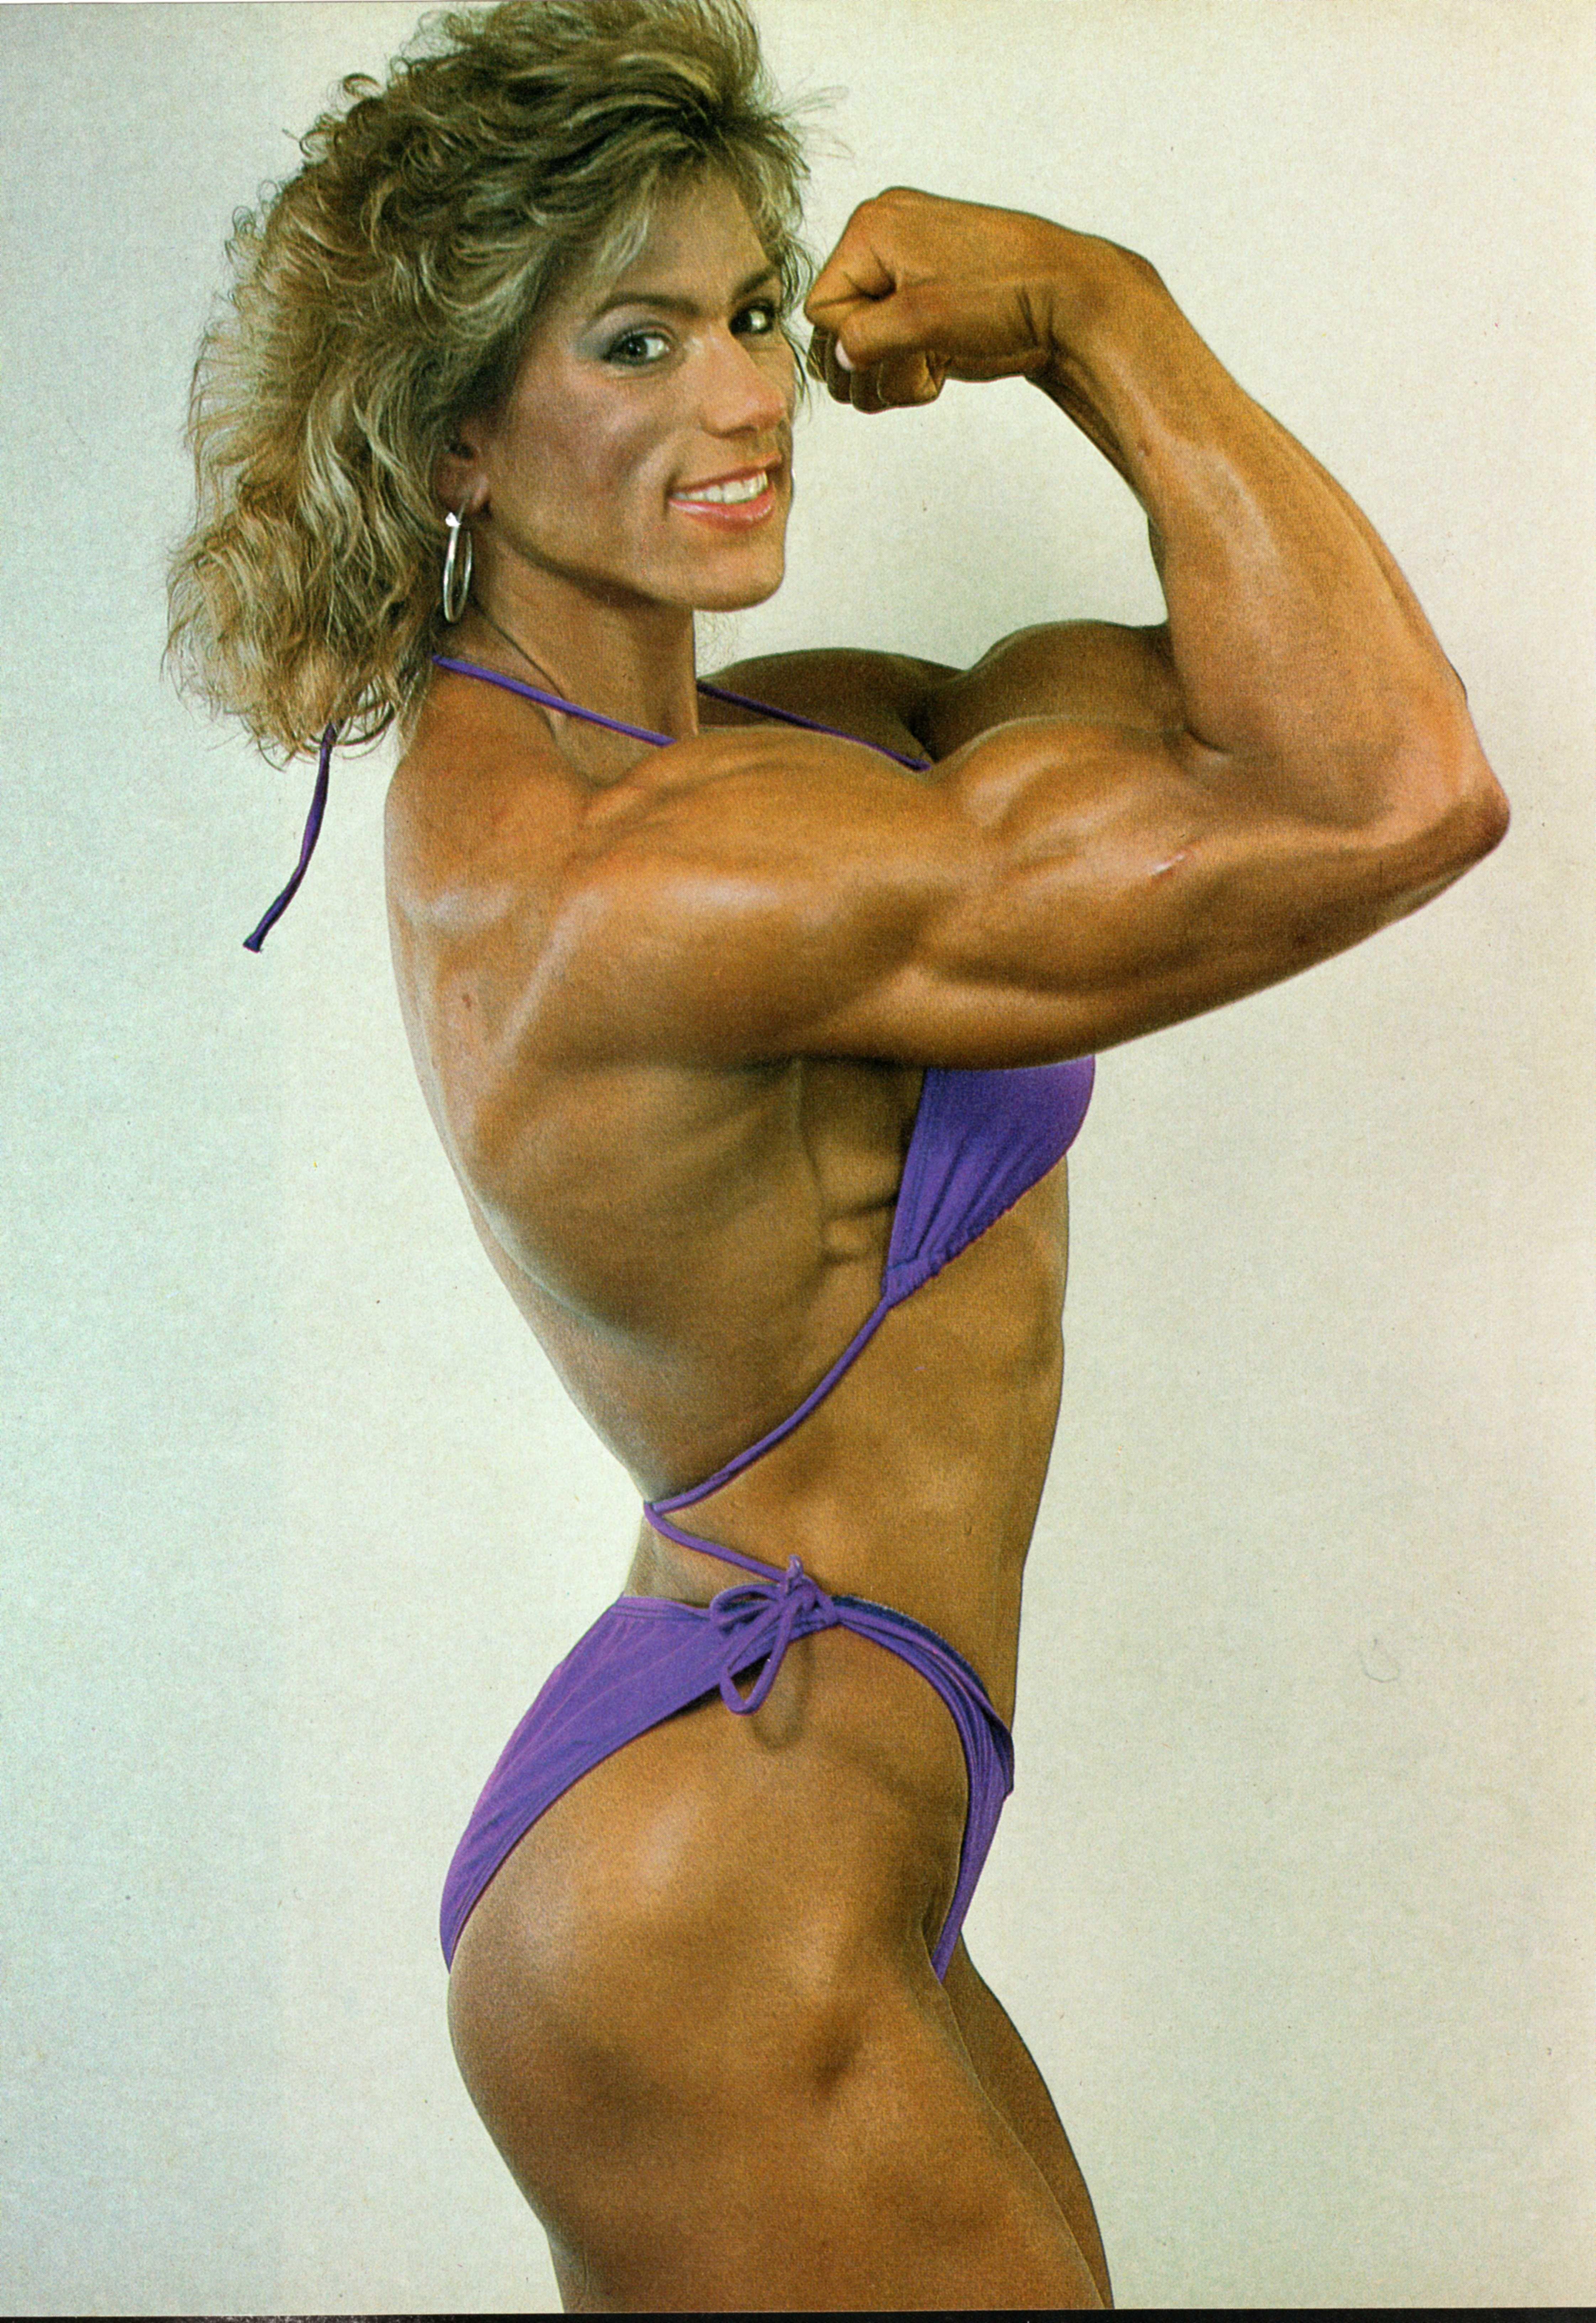 Remarkable, very Athlete female lesbian exact